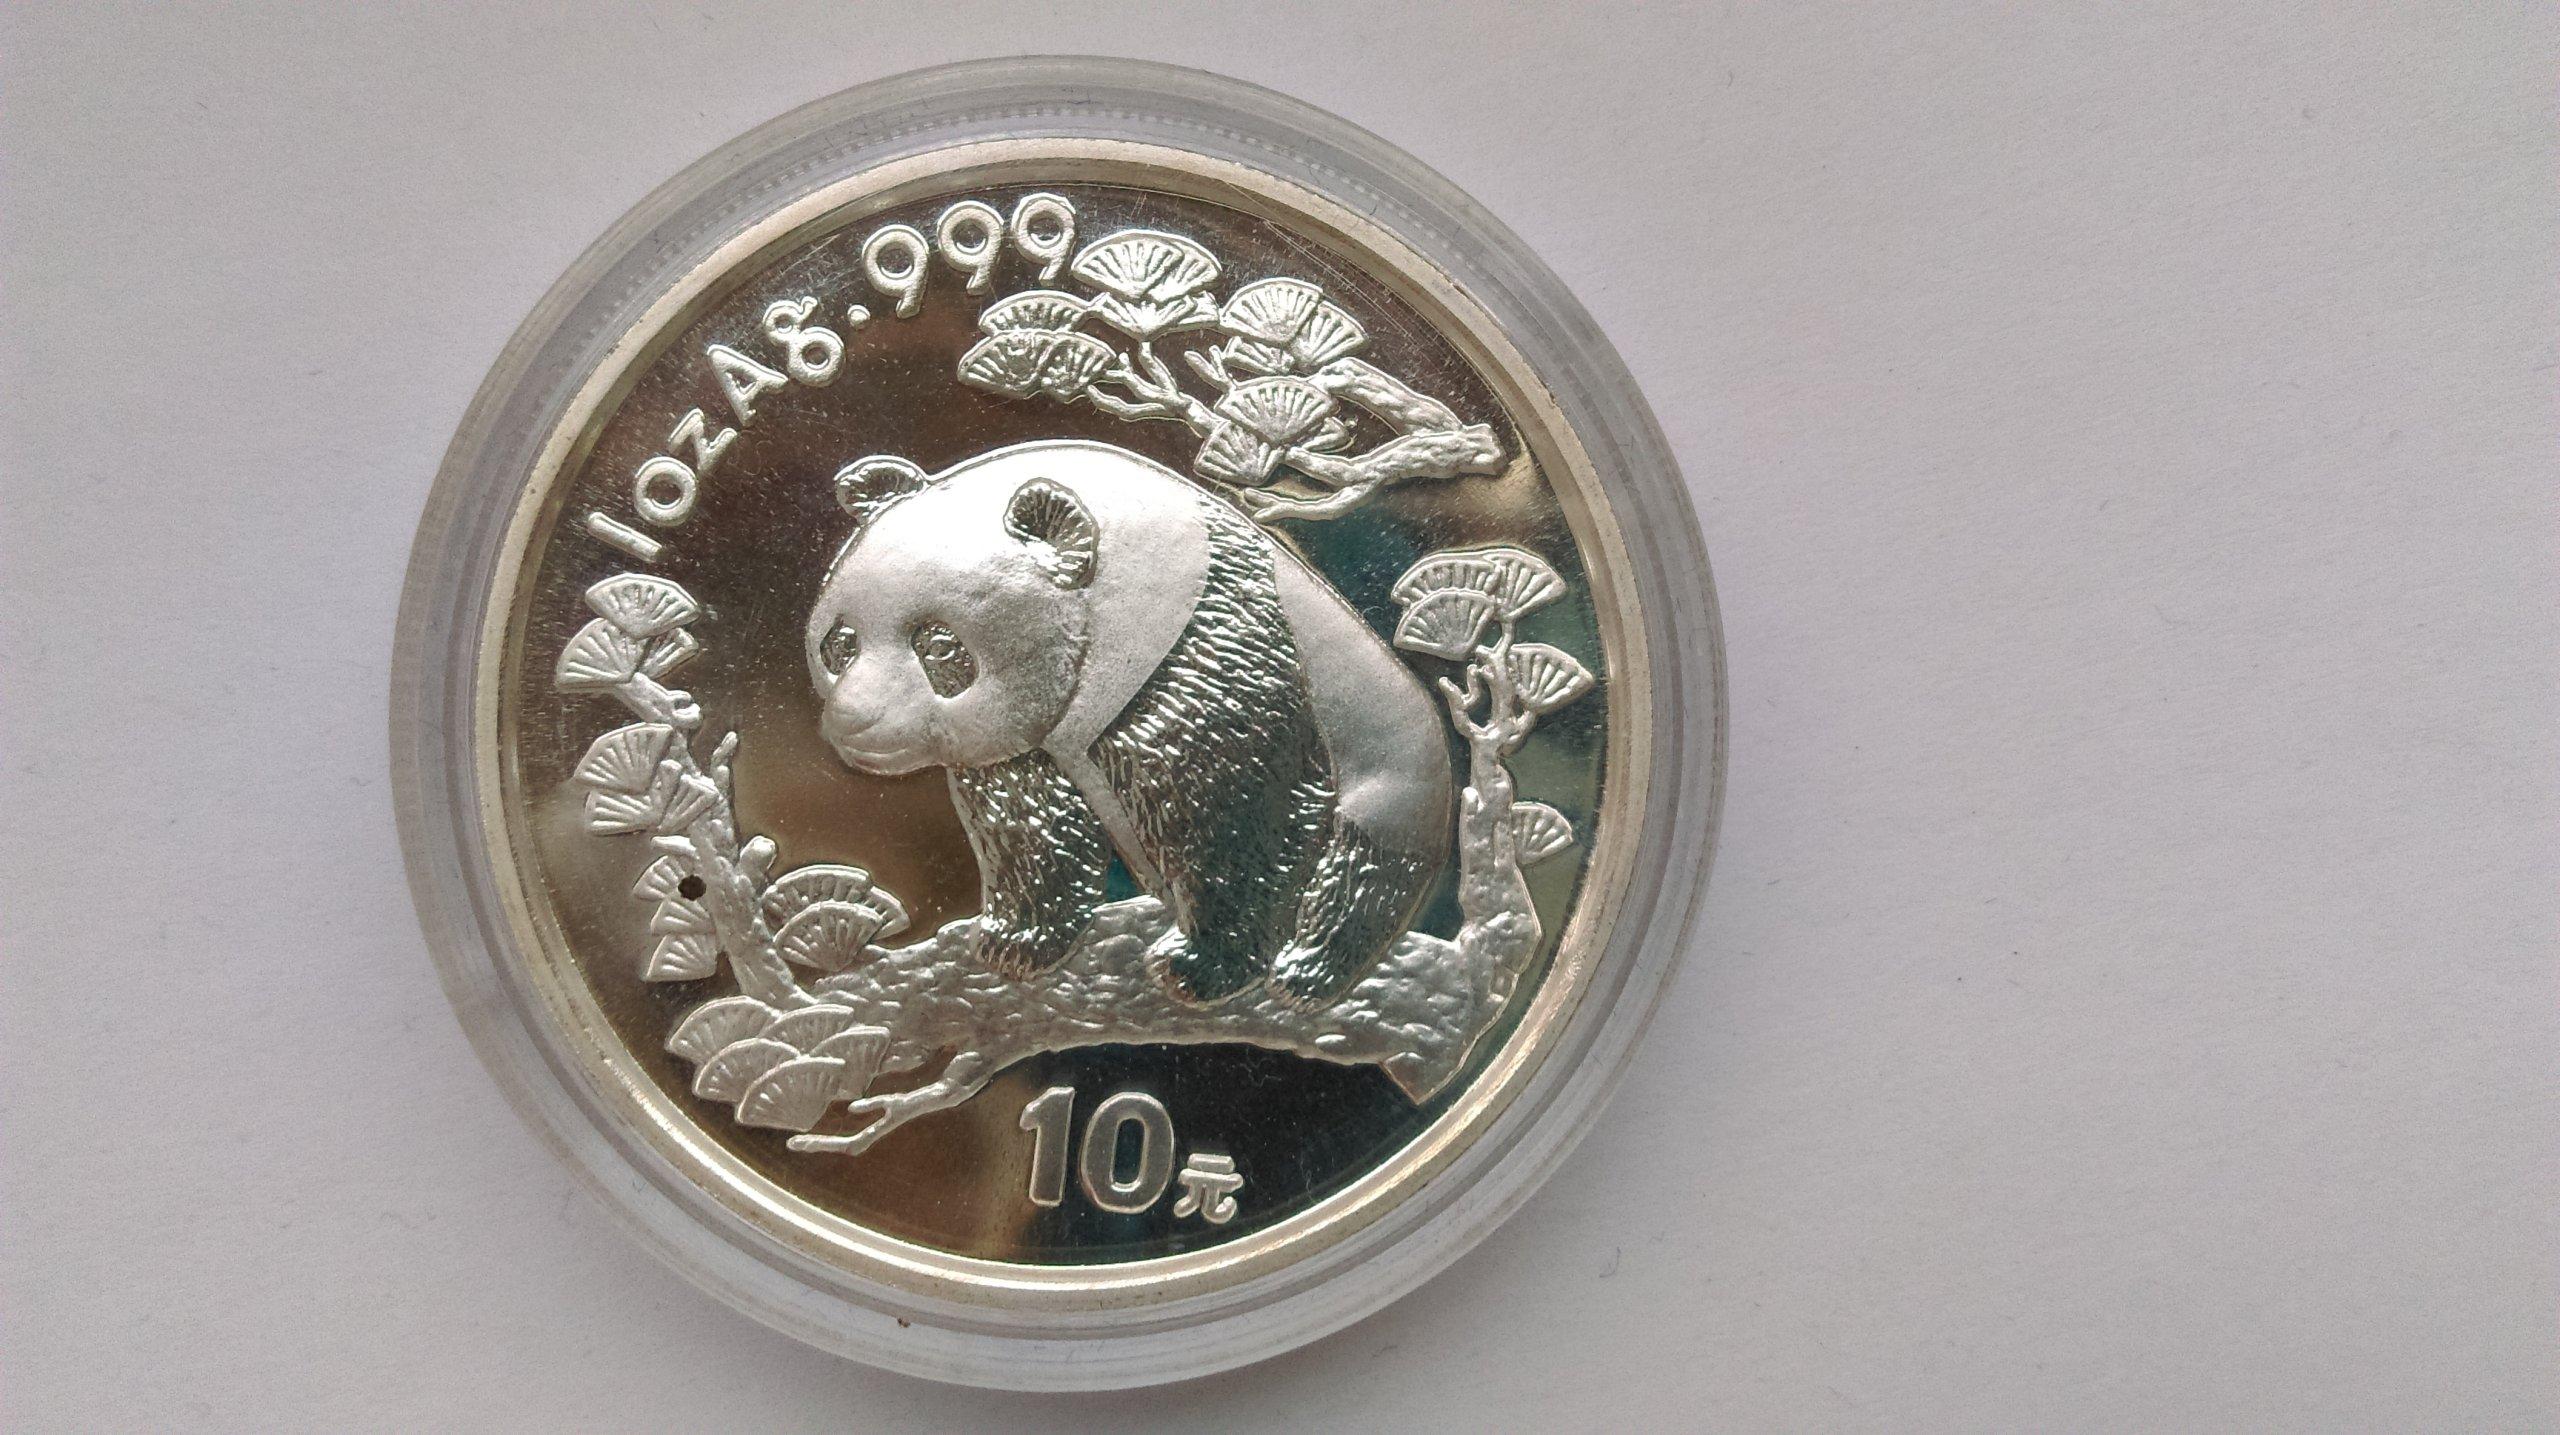 10 JUANÓW - CHINY - 1997